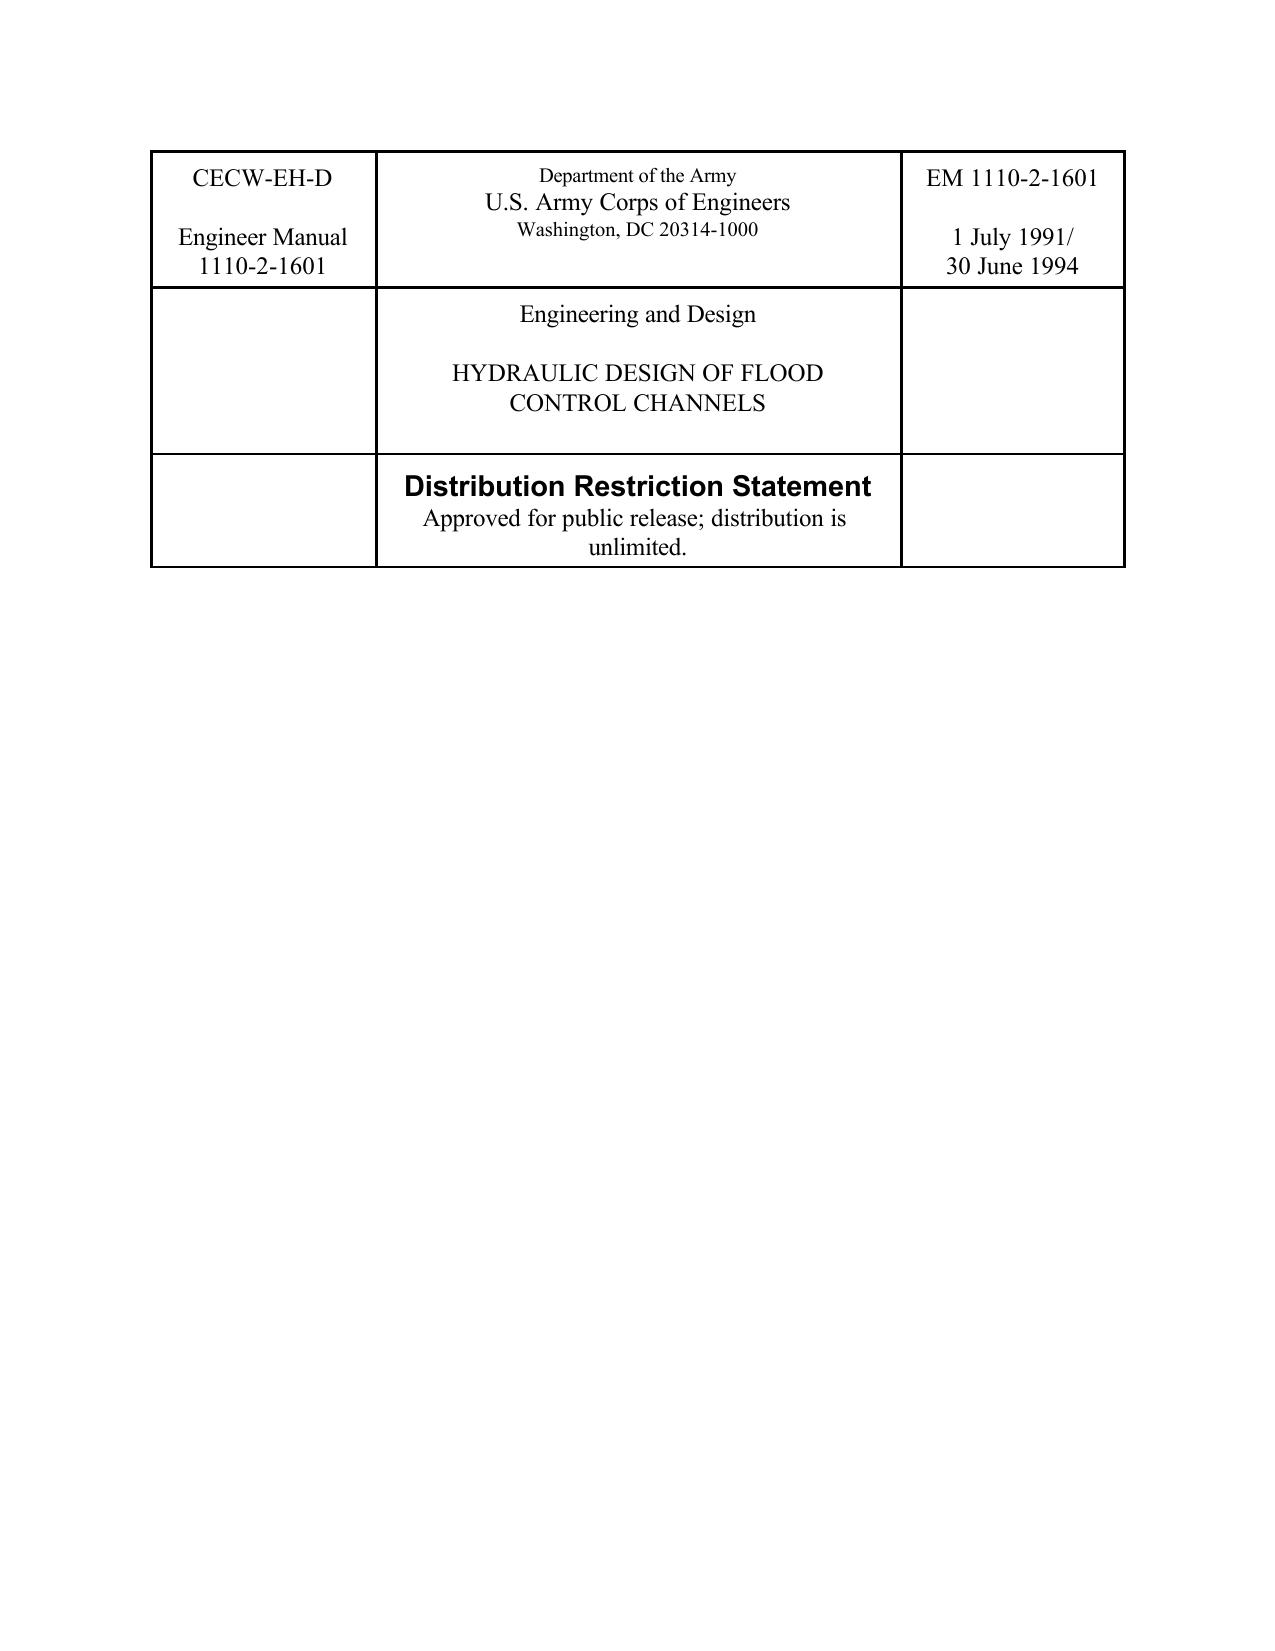 Cecw Eh D Em 1110 2 1601 U S Army Corps Of Engineers Engineer Manual